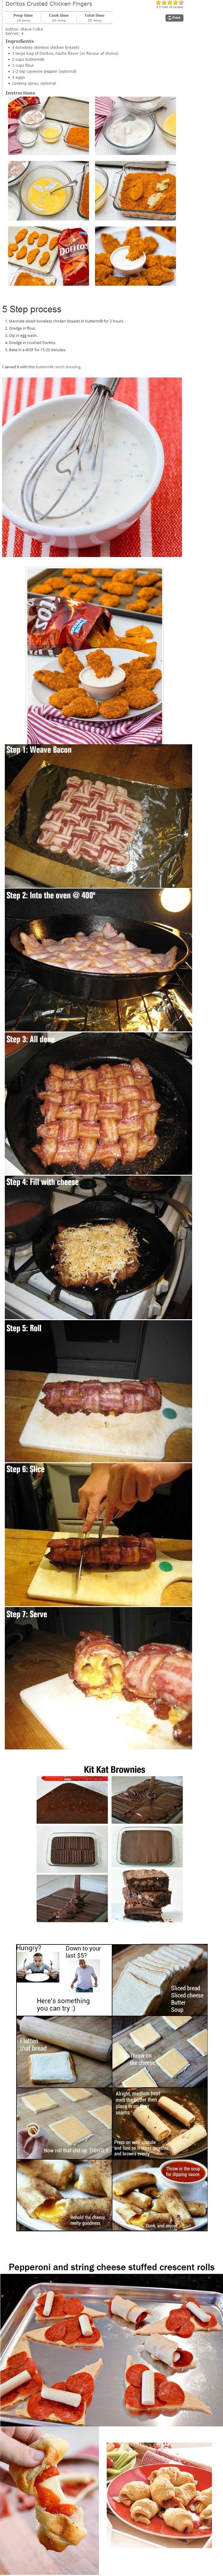 Mini food comp. I decided to make a food comp, I hope you guys enjoy. More to come soon!.. [Cholesterol Rises Internally]